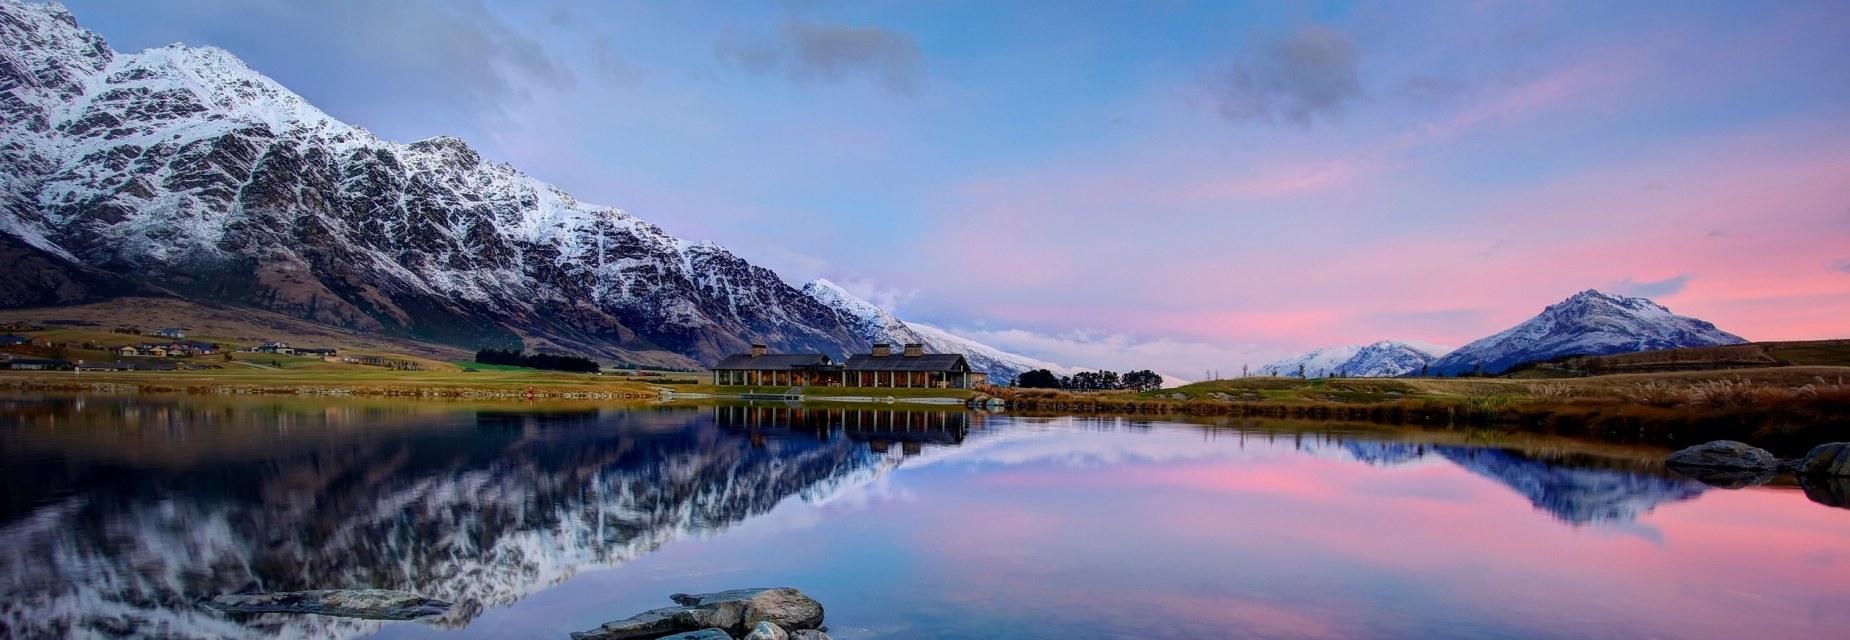 High Resolution Wallpaper | Lake Wakatipu 1850x640 px